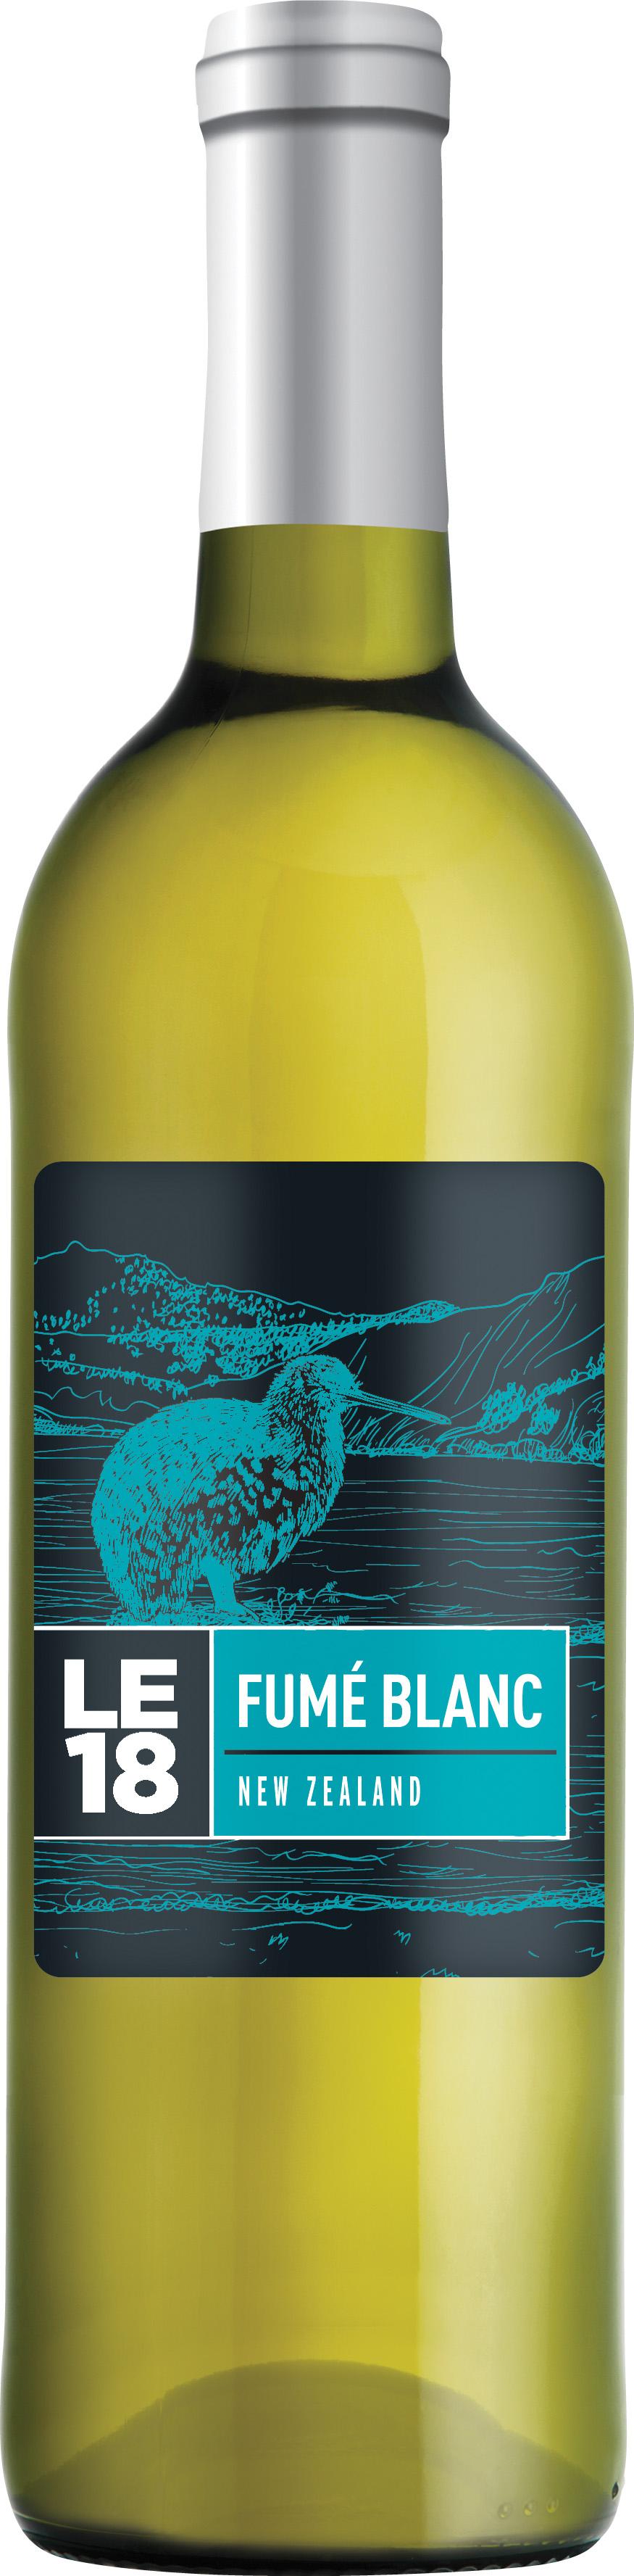 18123 WX_LE18 Fume Blanc Bottle.jpg